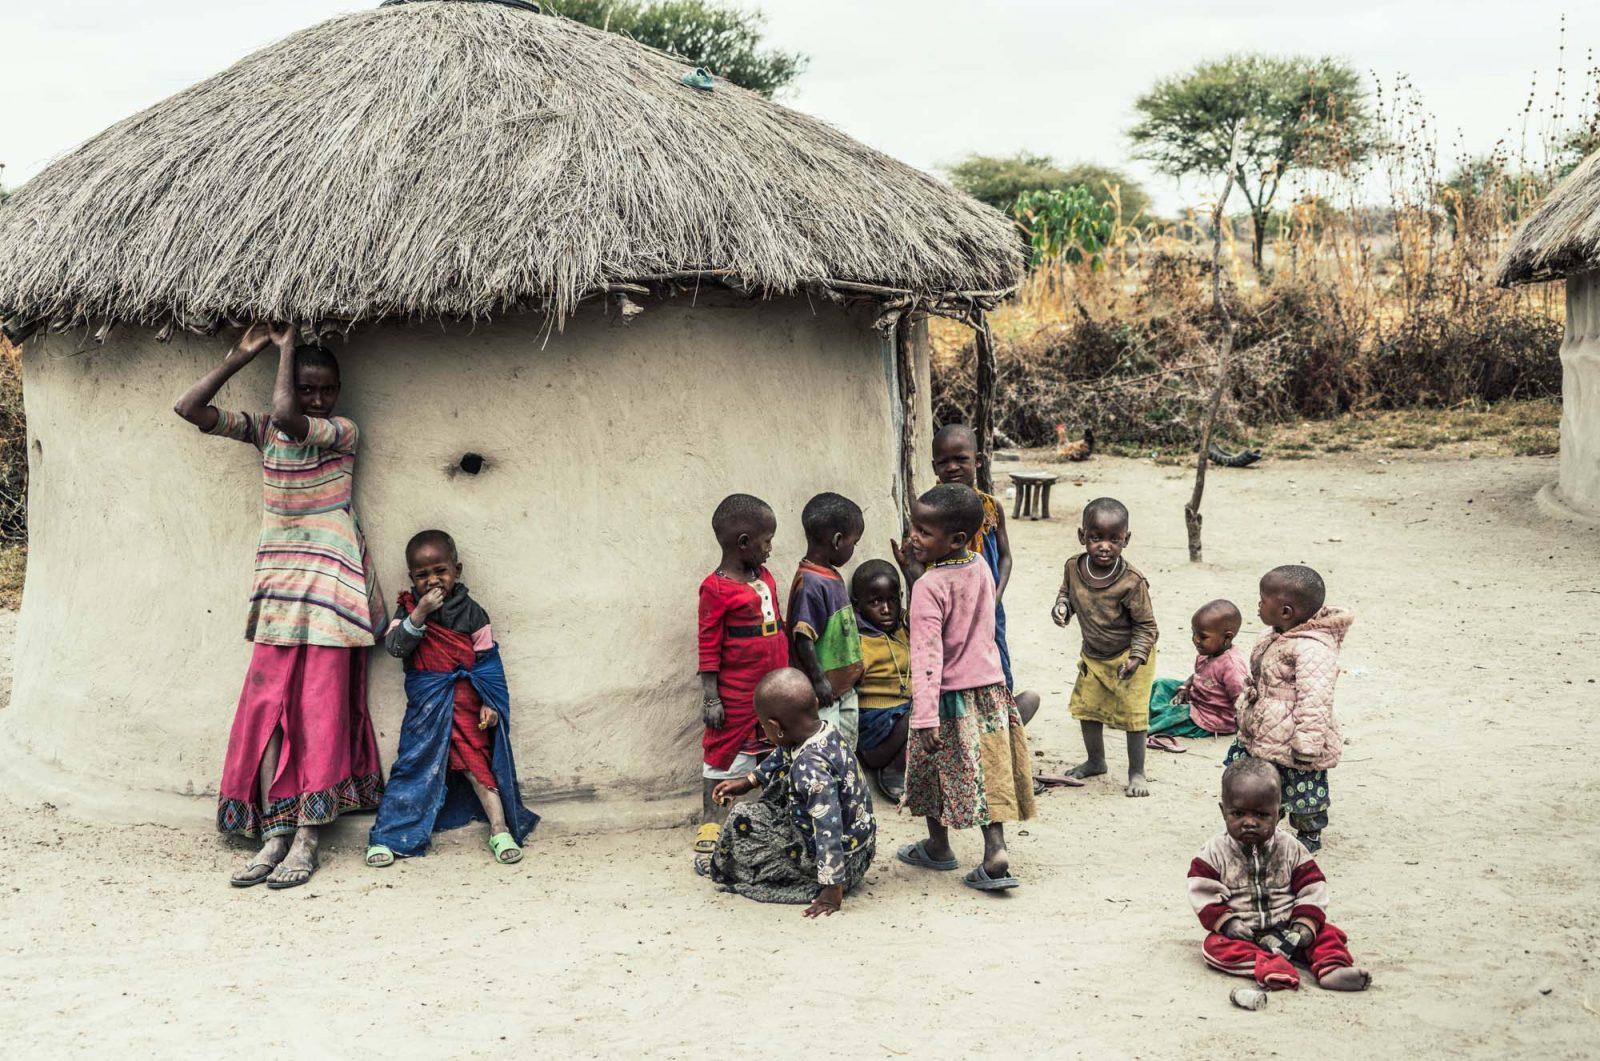 Maasai village, Serengeti